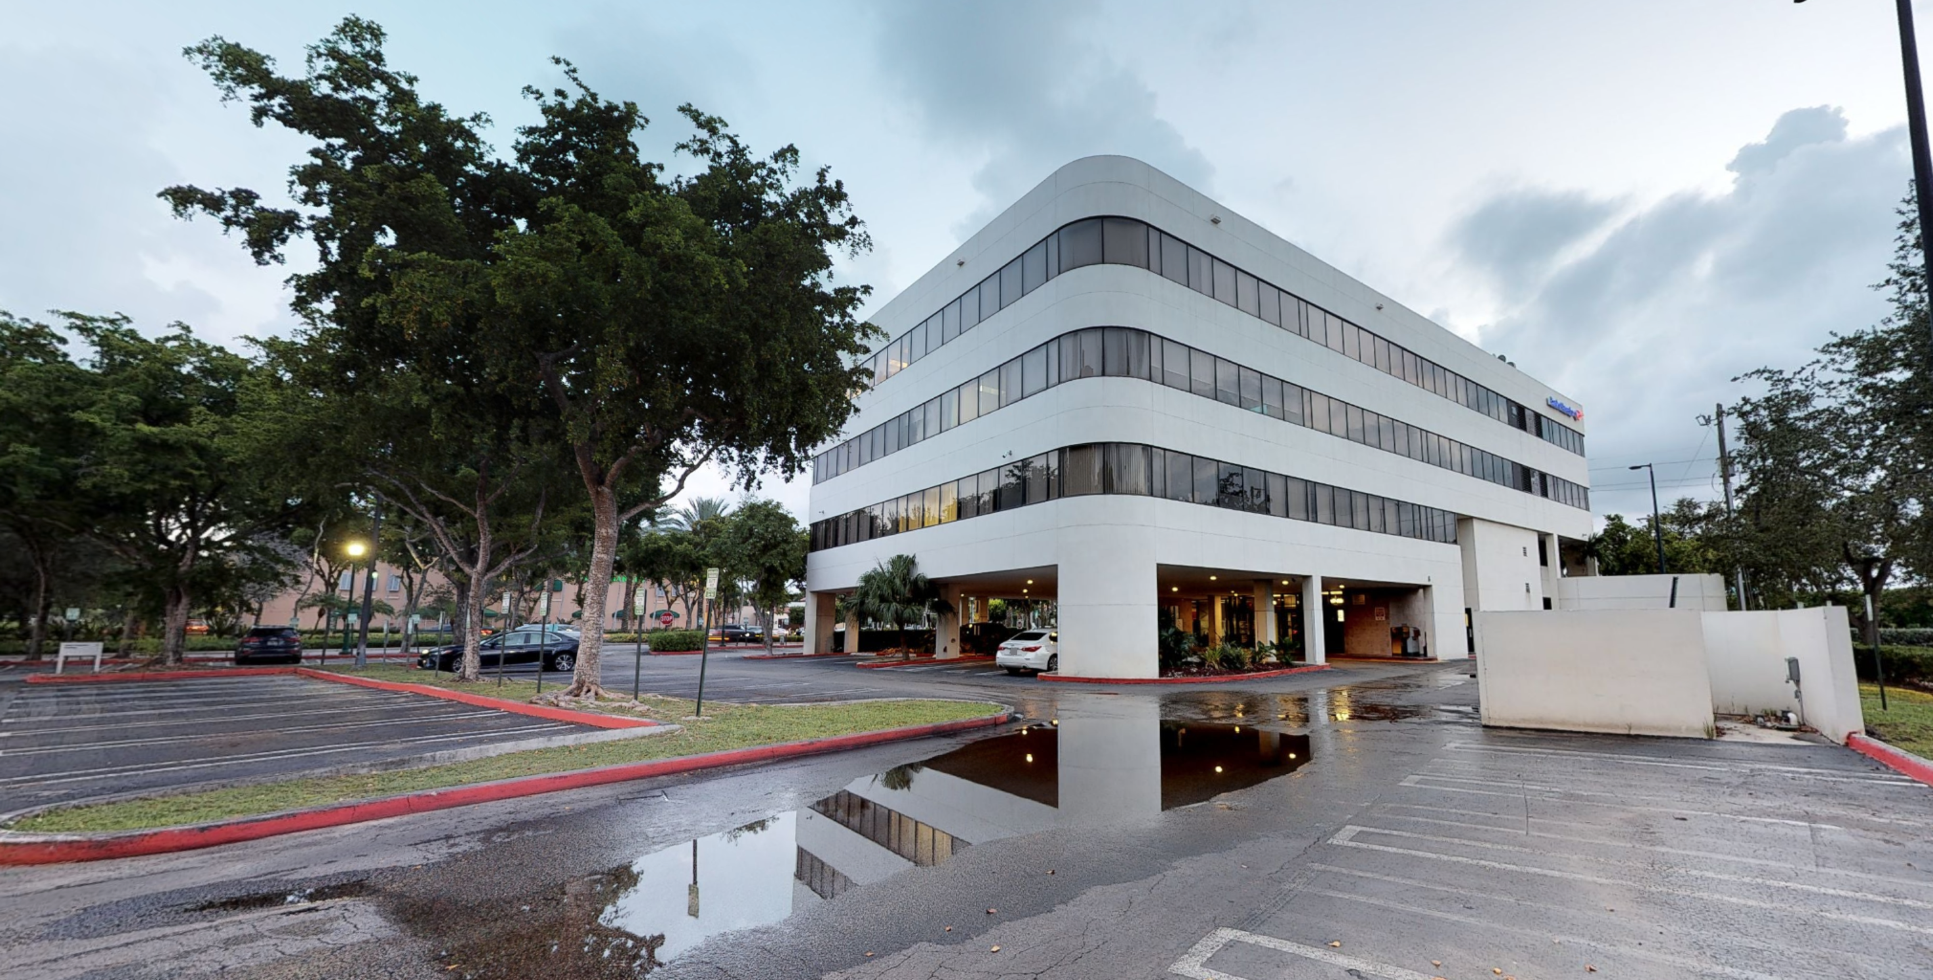 Bank of America financial center with drive-thru ATM | 18305 Biscayne Blvd, Aventura, FL 33160